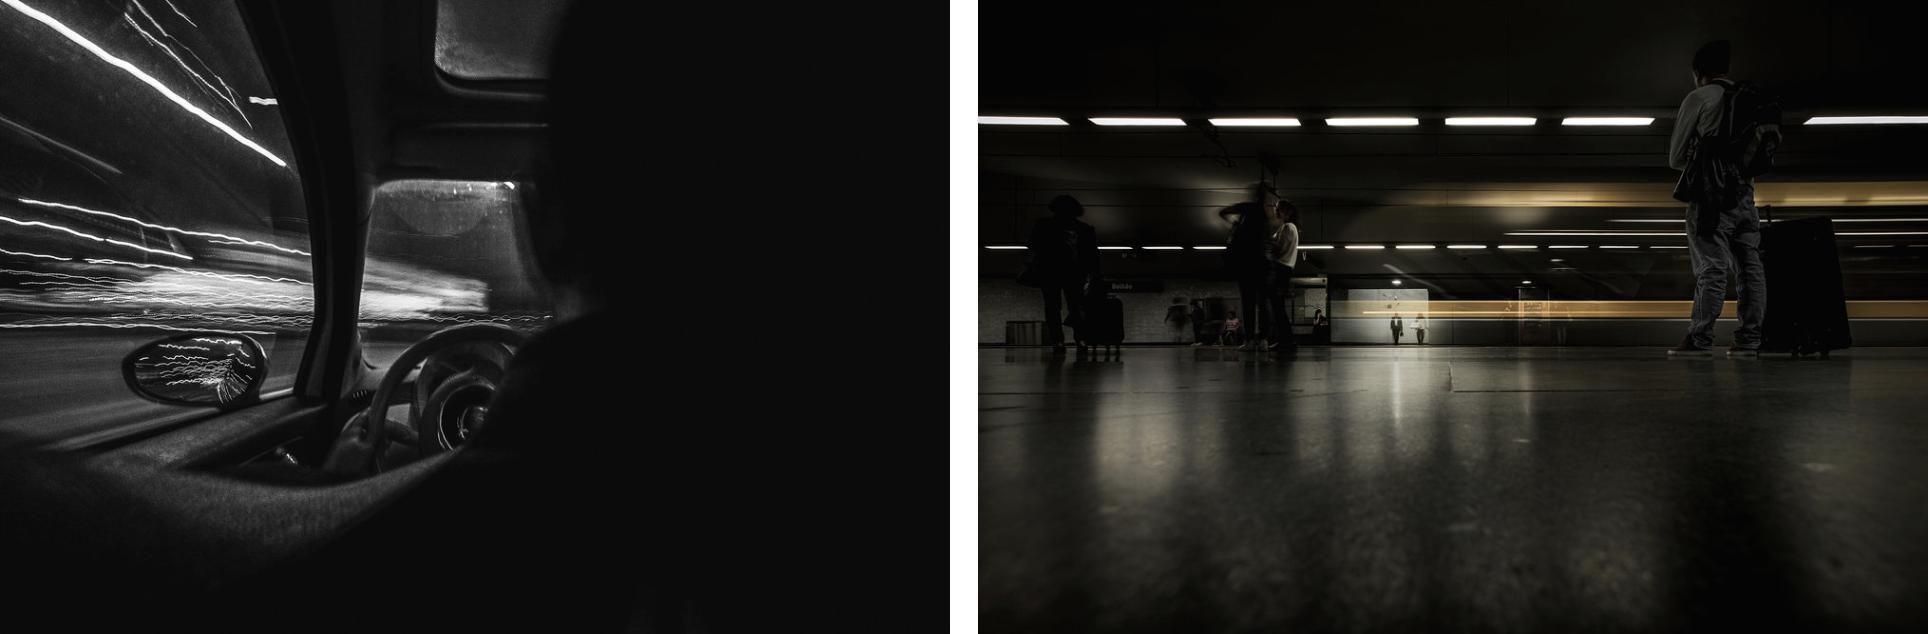 In Transit bonjourmolotov Andre Gigante Photography Experimenta Design 08.png